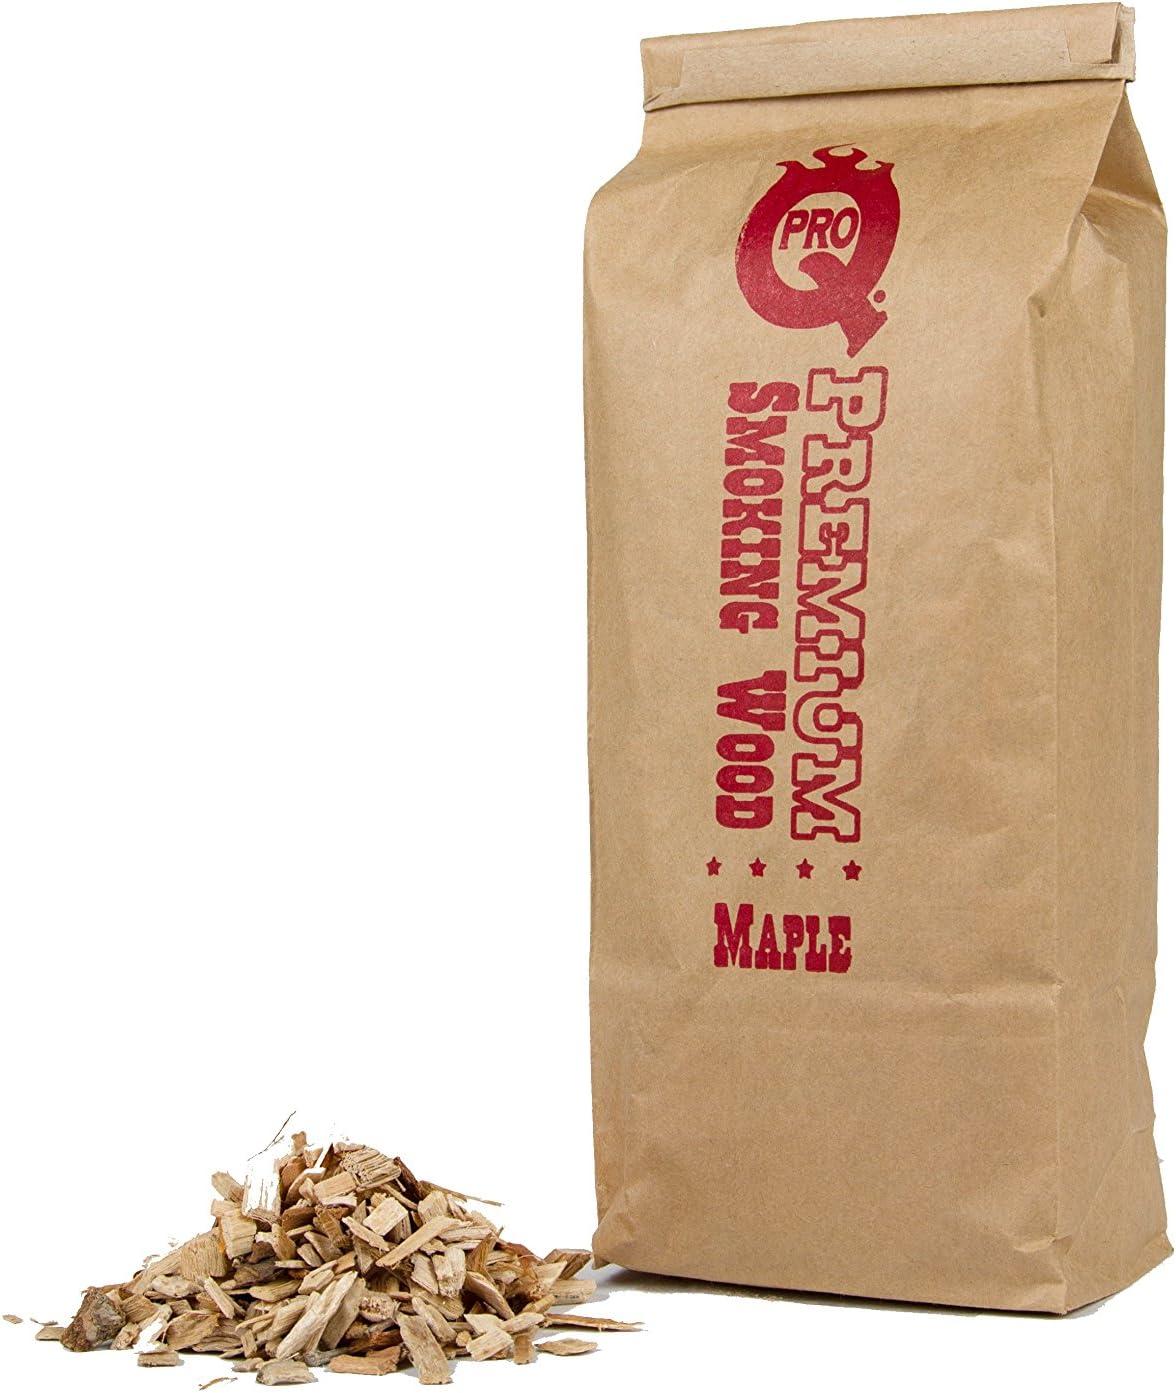 ProQ Smoking Wood Chips 3 Pack Cherry